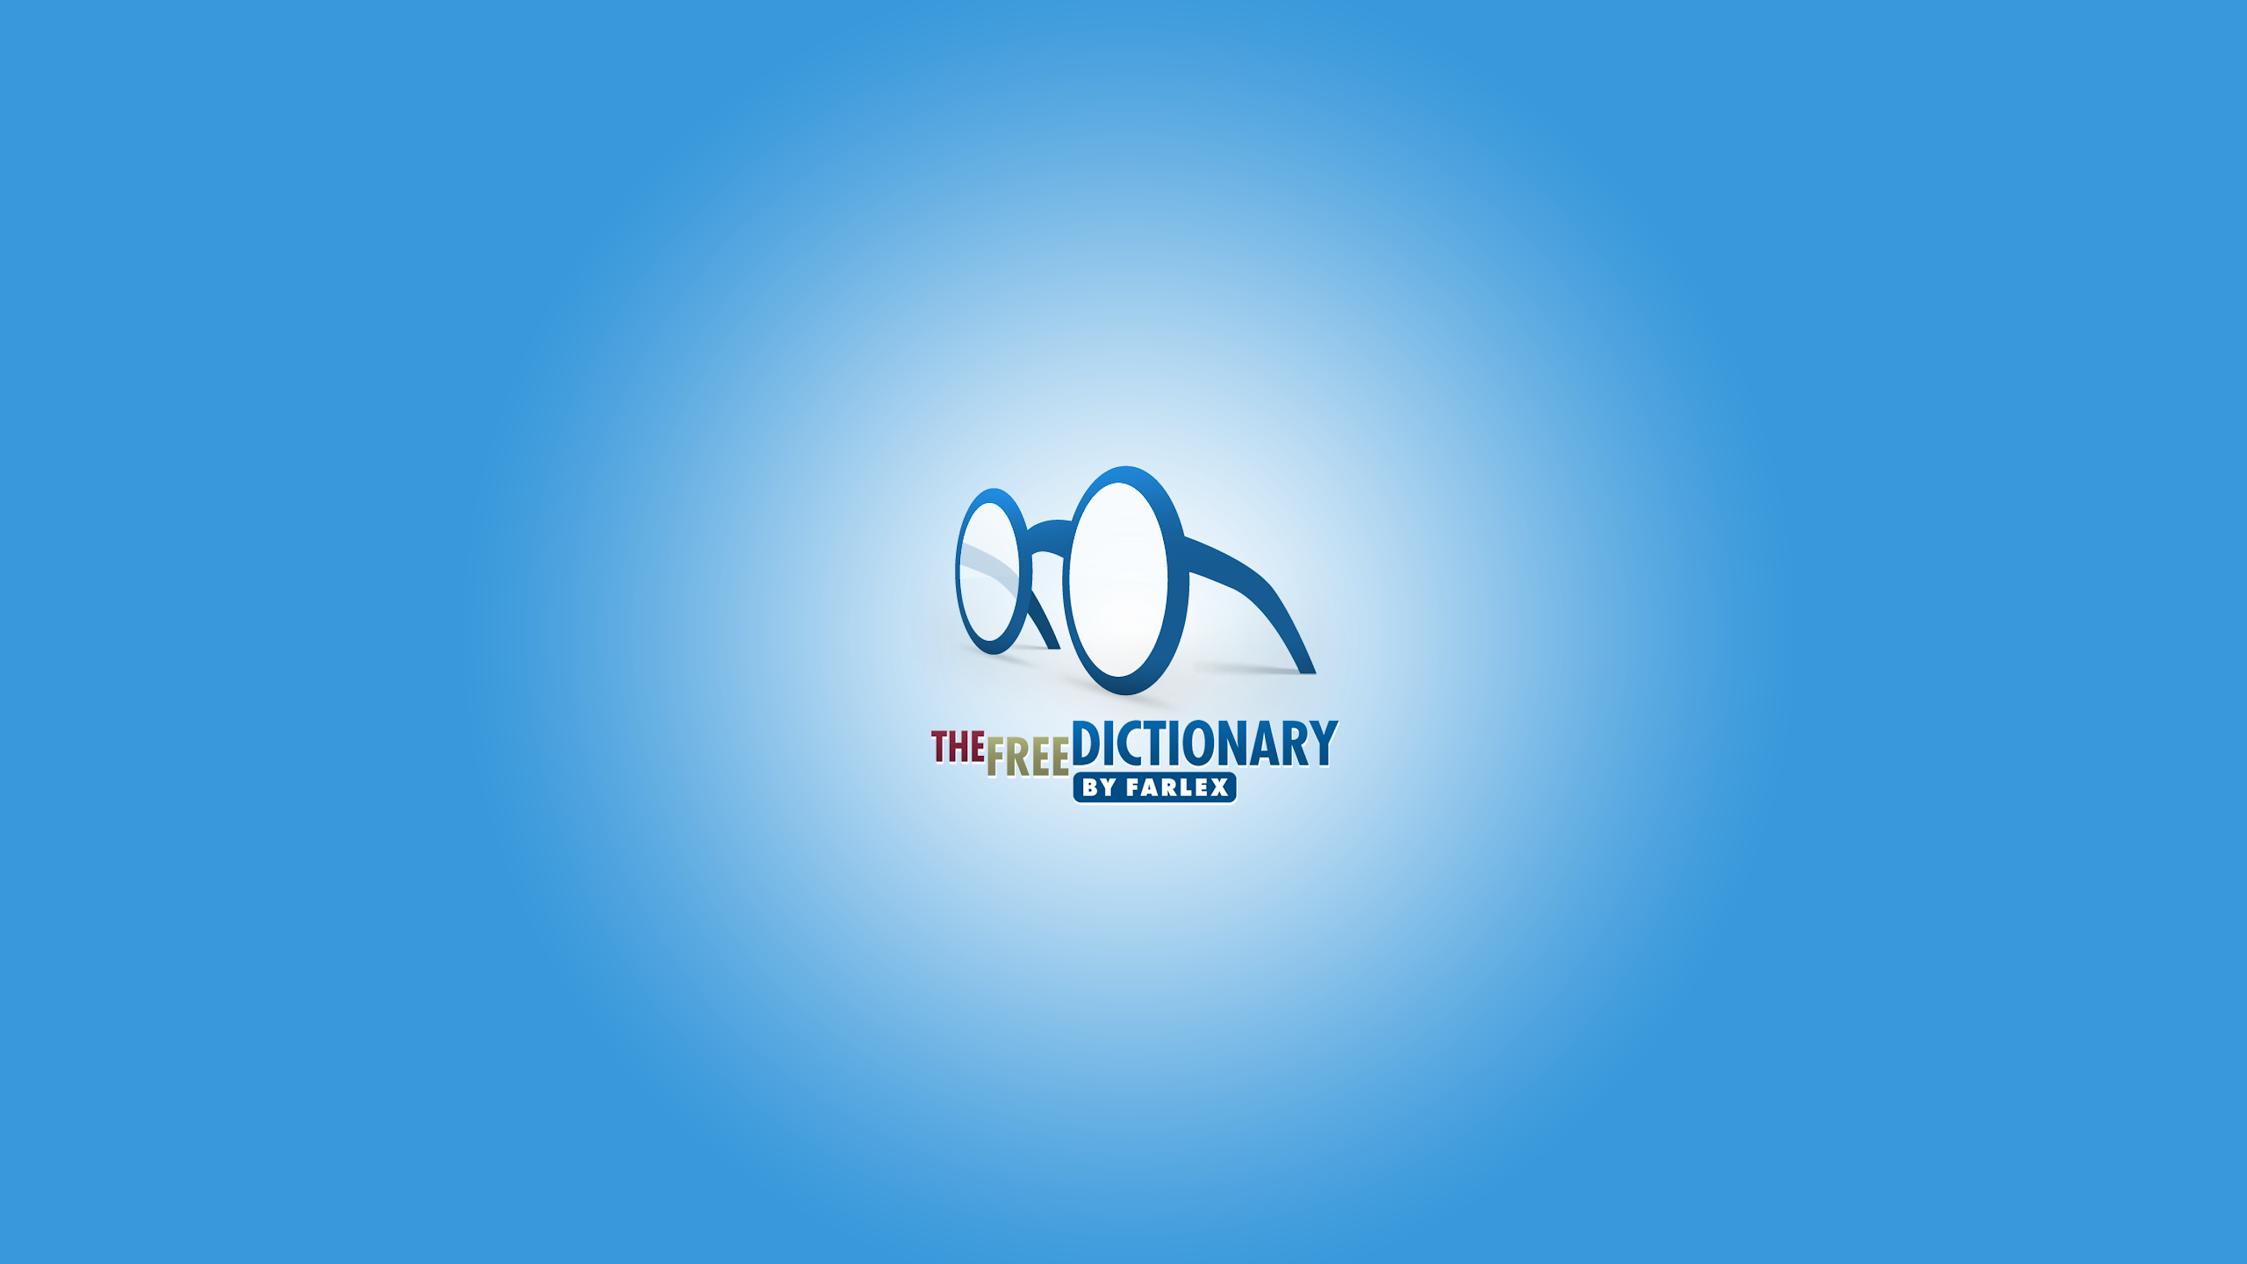 TheFreeDictionary.com – Farlex International Ltd